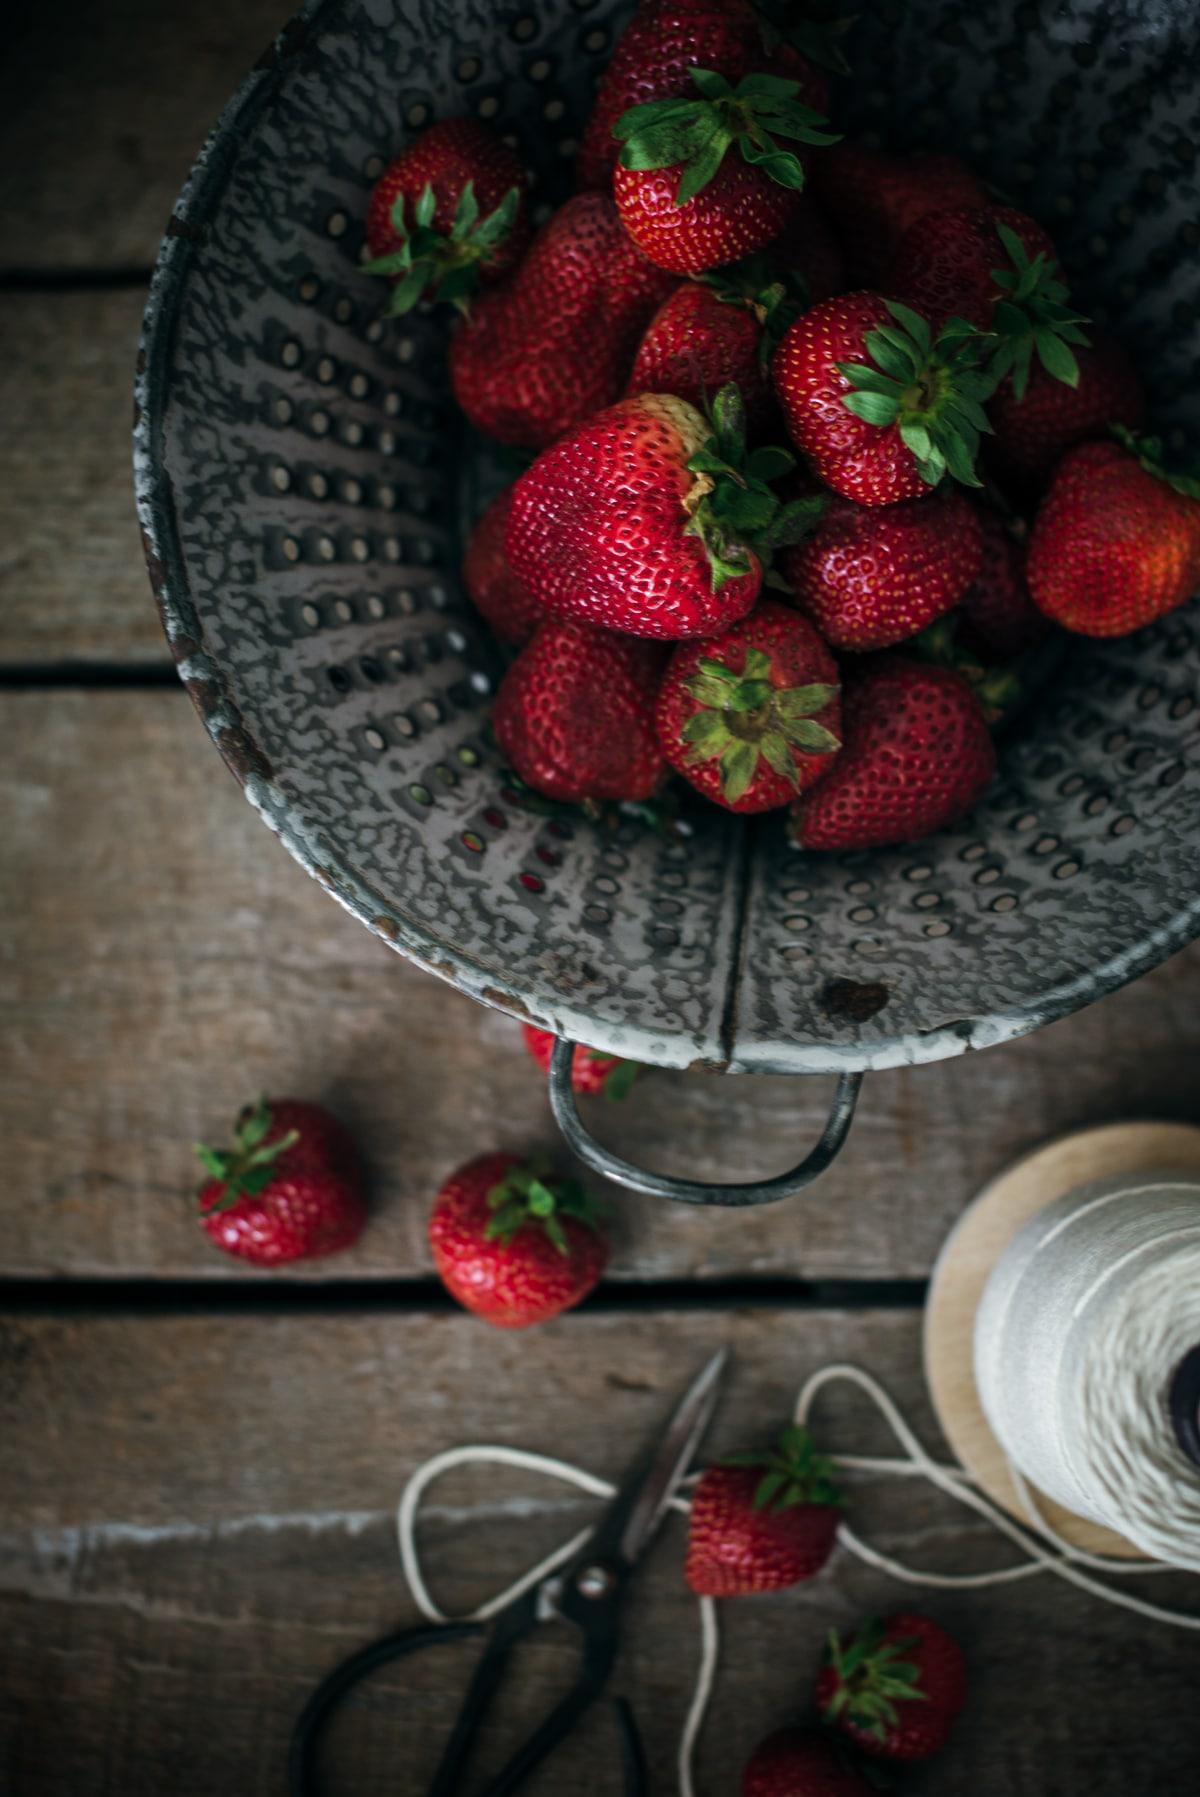 Collander of strawberries